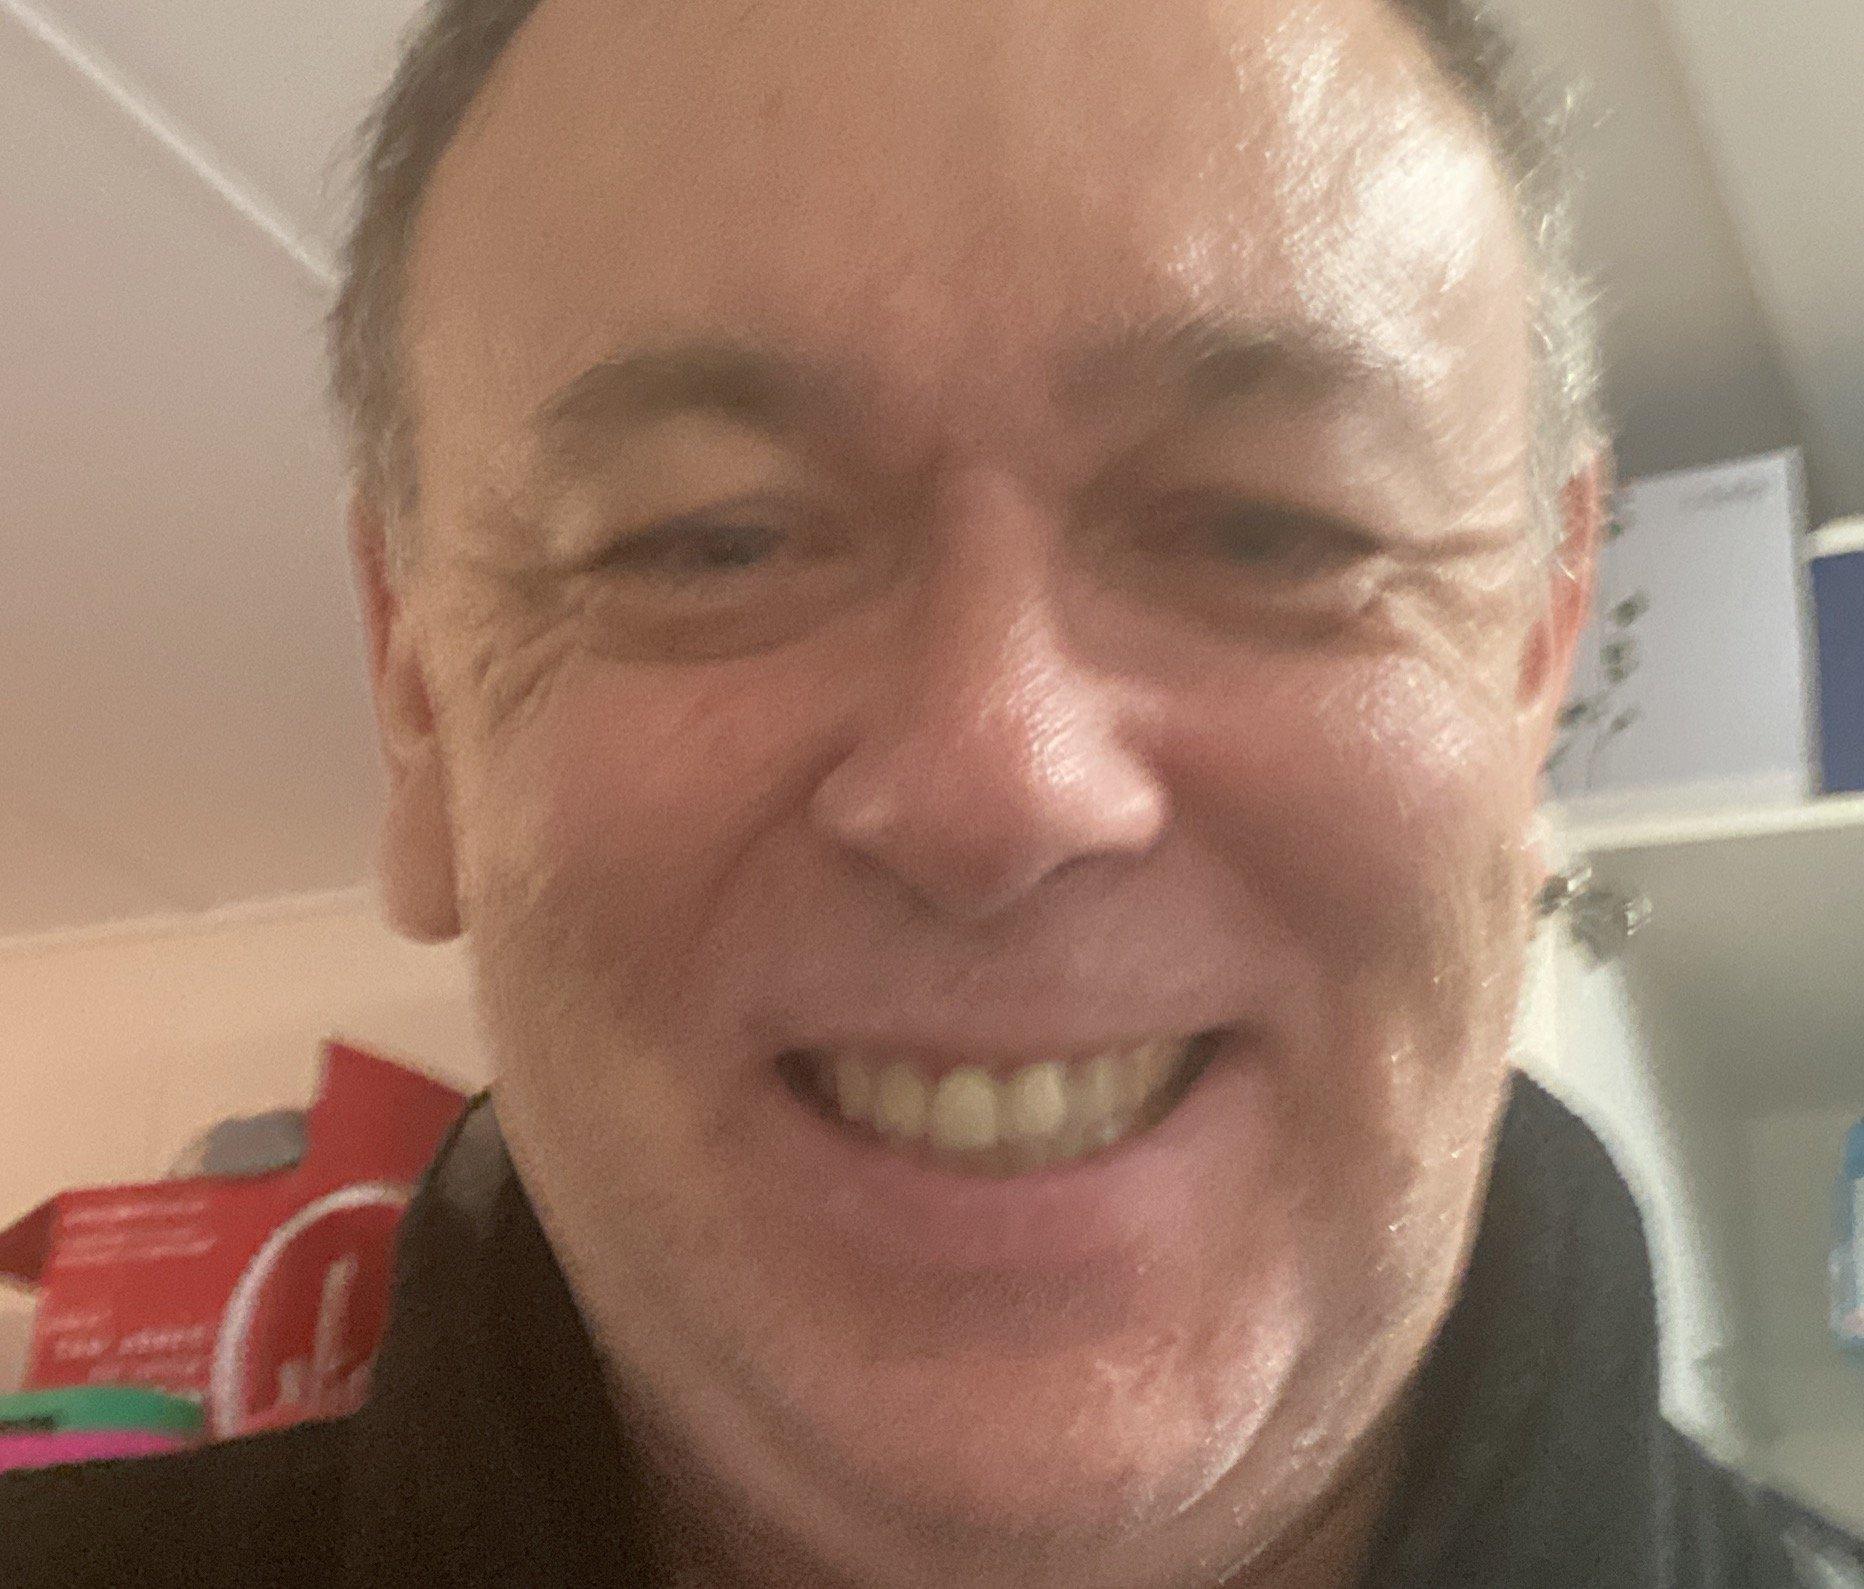 Sadar from New South Wales,Australia